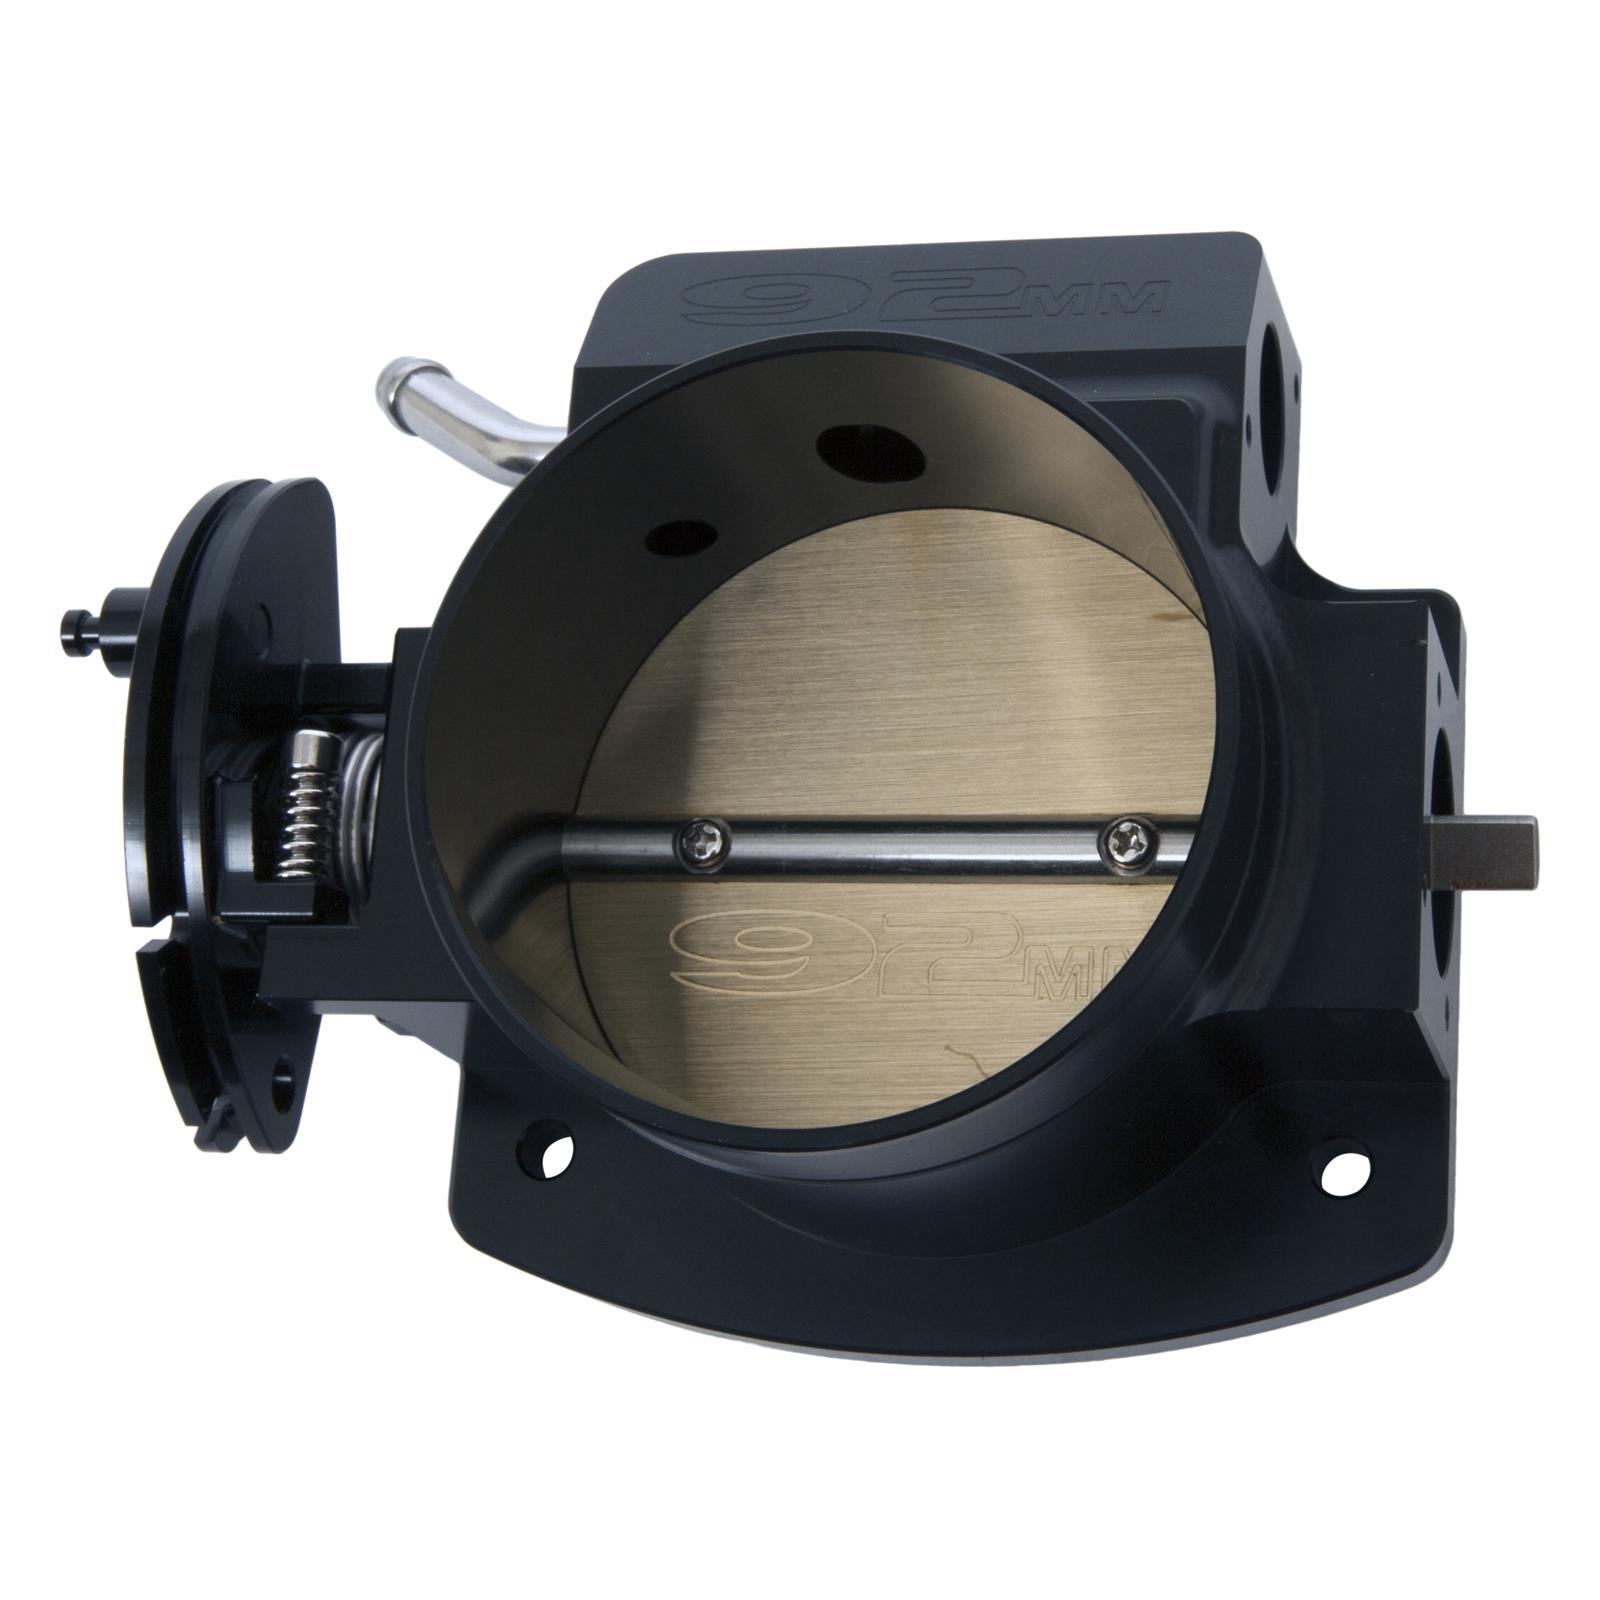 TPS/&IAC Throttle Position Sensor set For LSX LS 92mm Throttle body GM Gen III